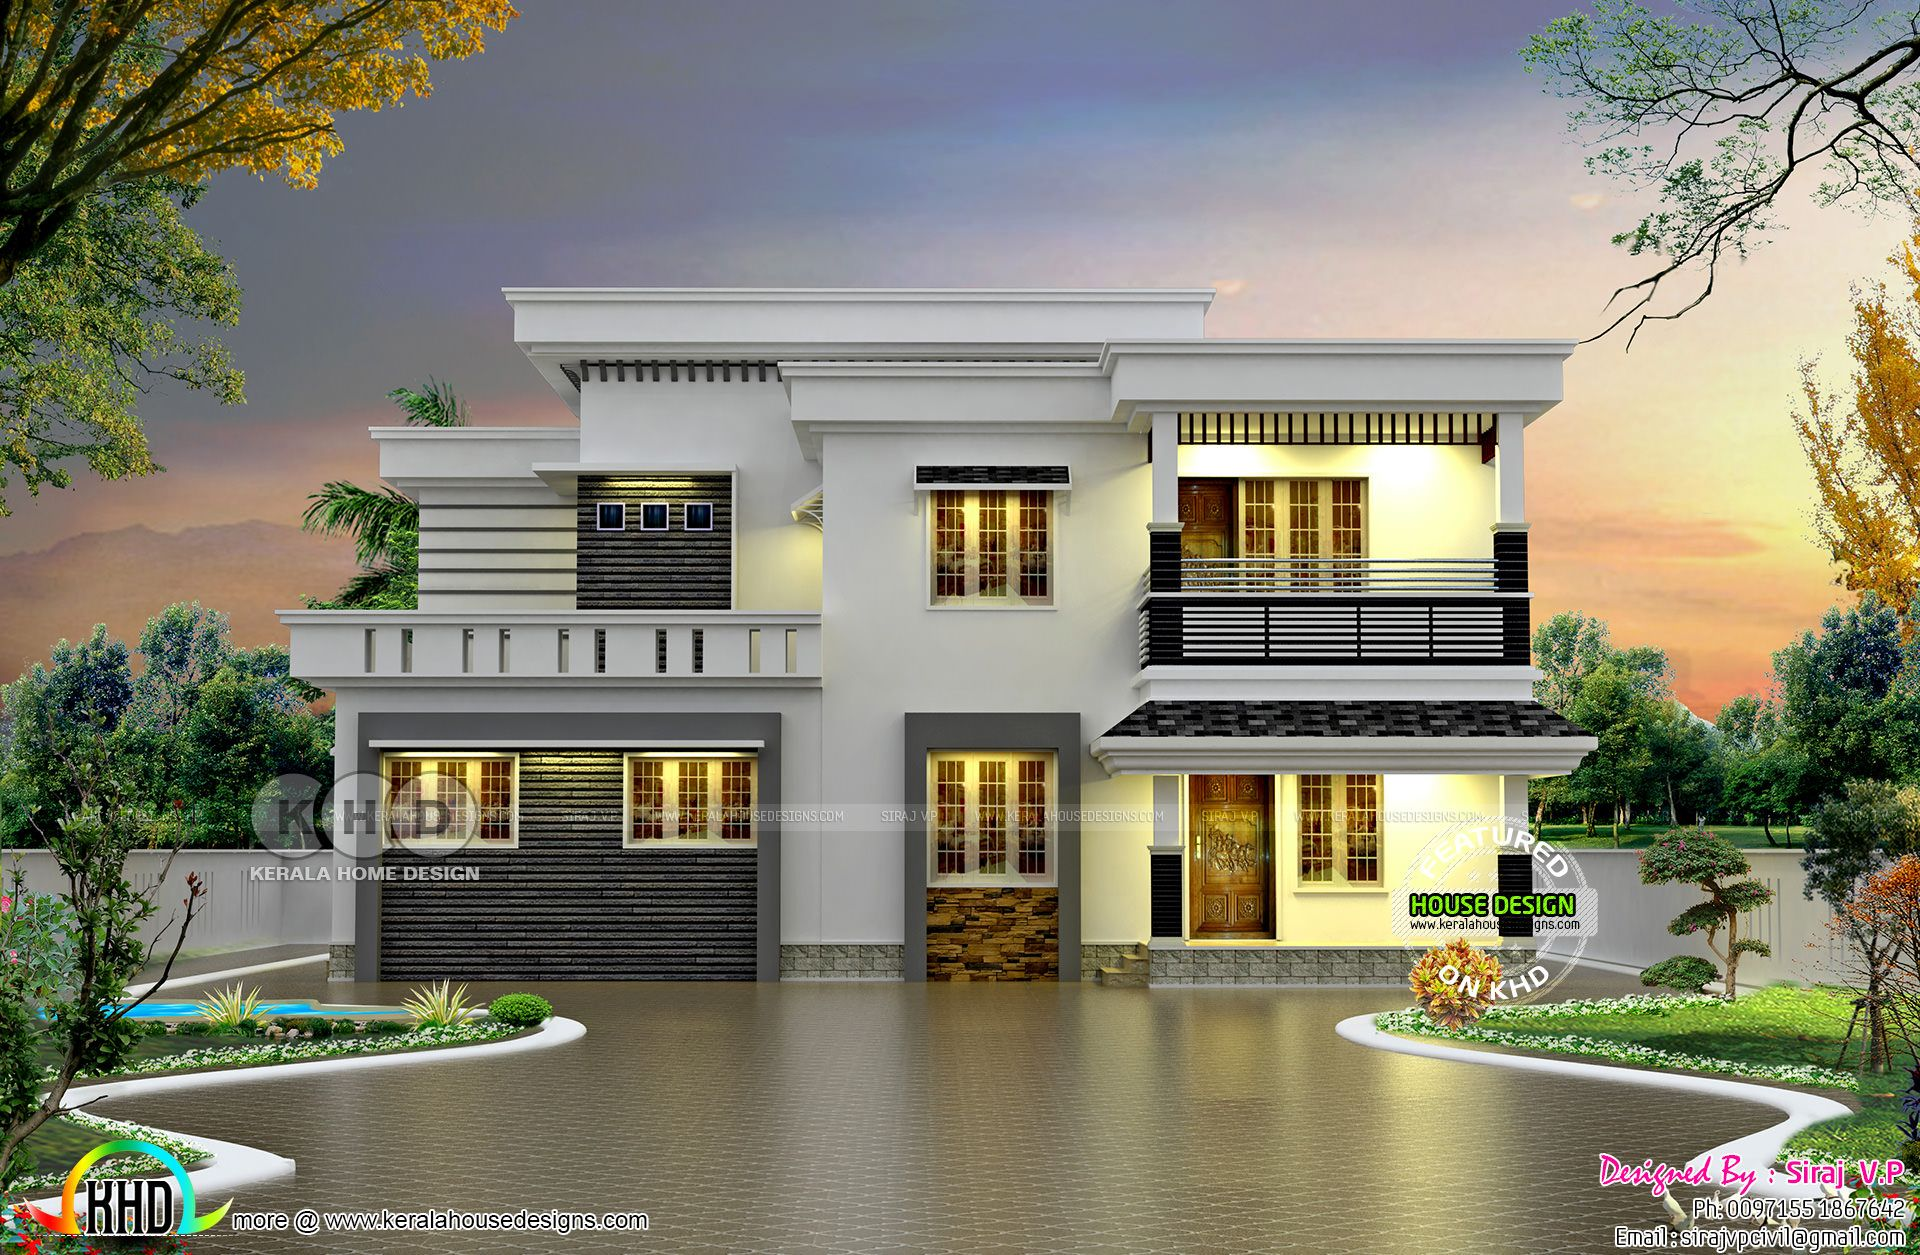 House 01 Flatroof Jpg 1920 1255 Kerala House Design Architect Design House Unique House Design